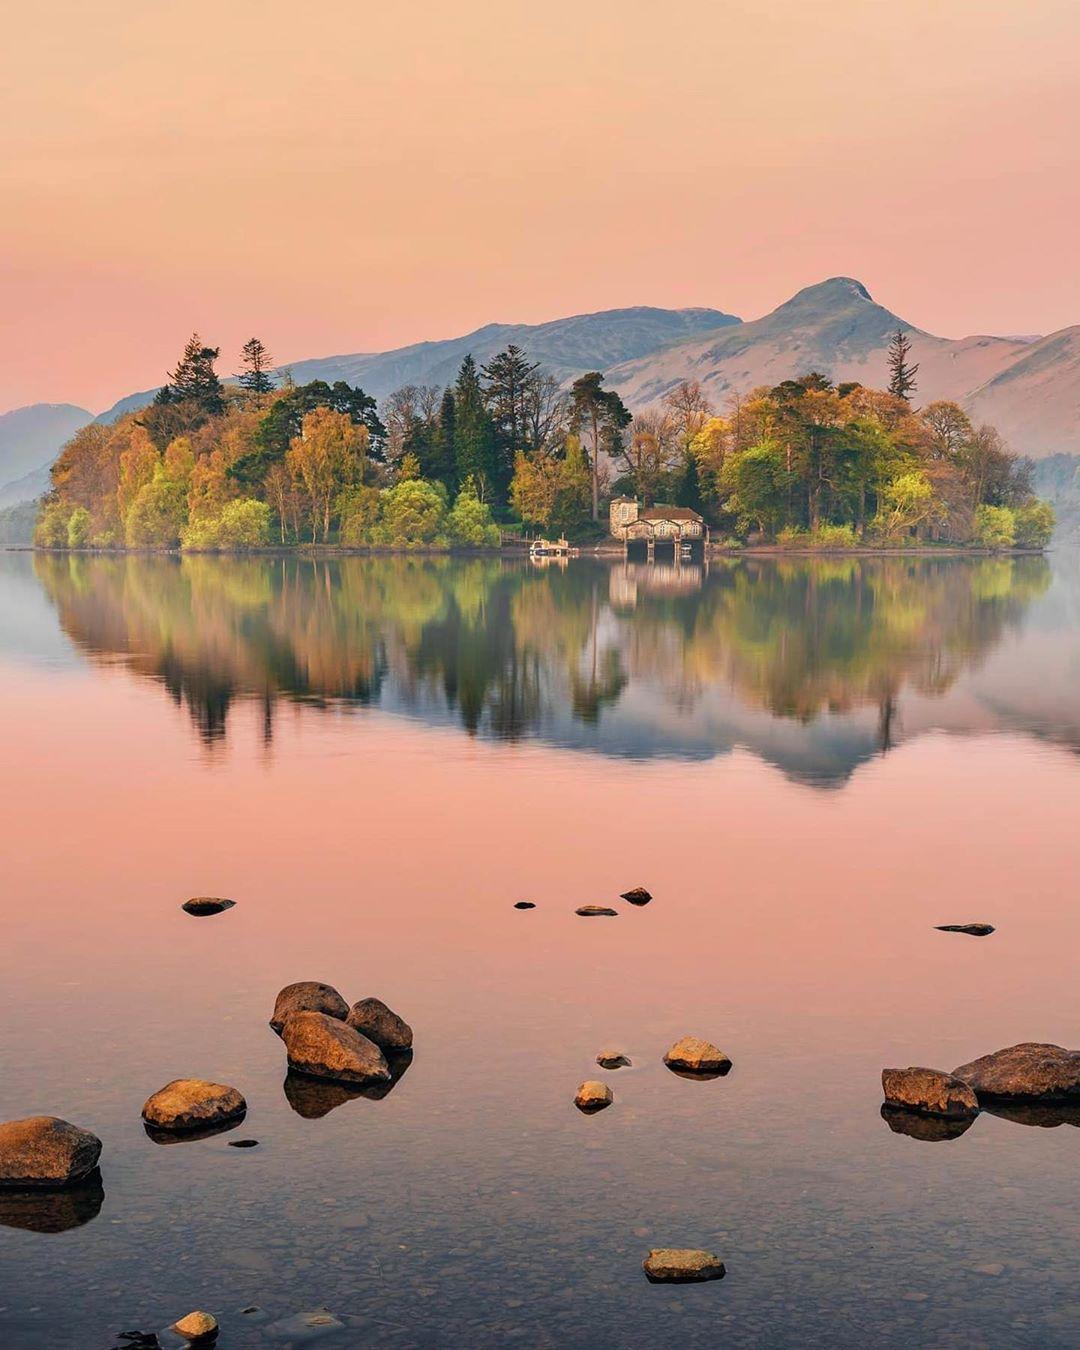 Lake District On Instagram Which Shot Of Derwent Isle On Derwentwater Do You Like The Best 1 Lake District England Lake District Lake District National Park